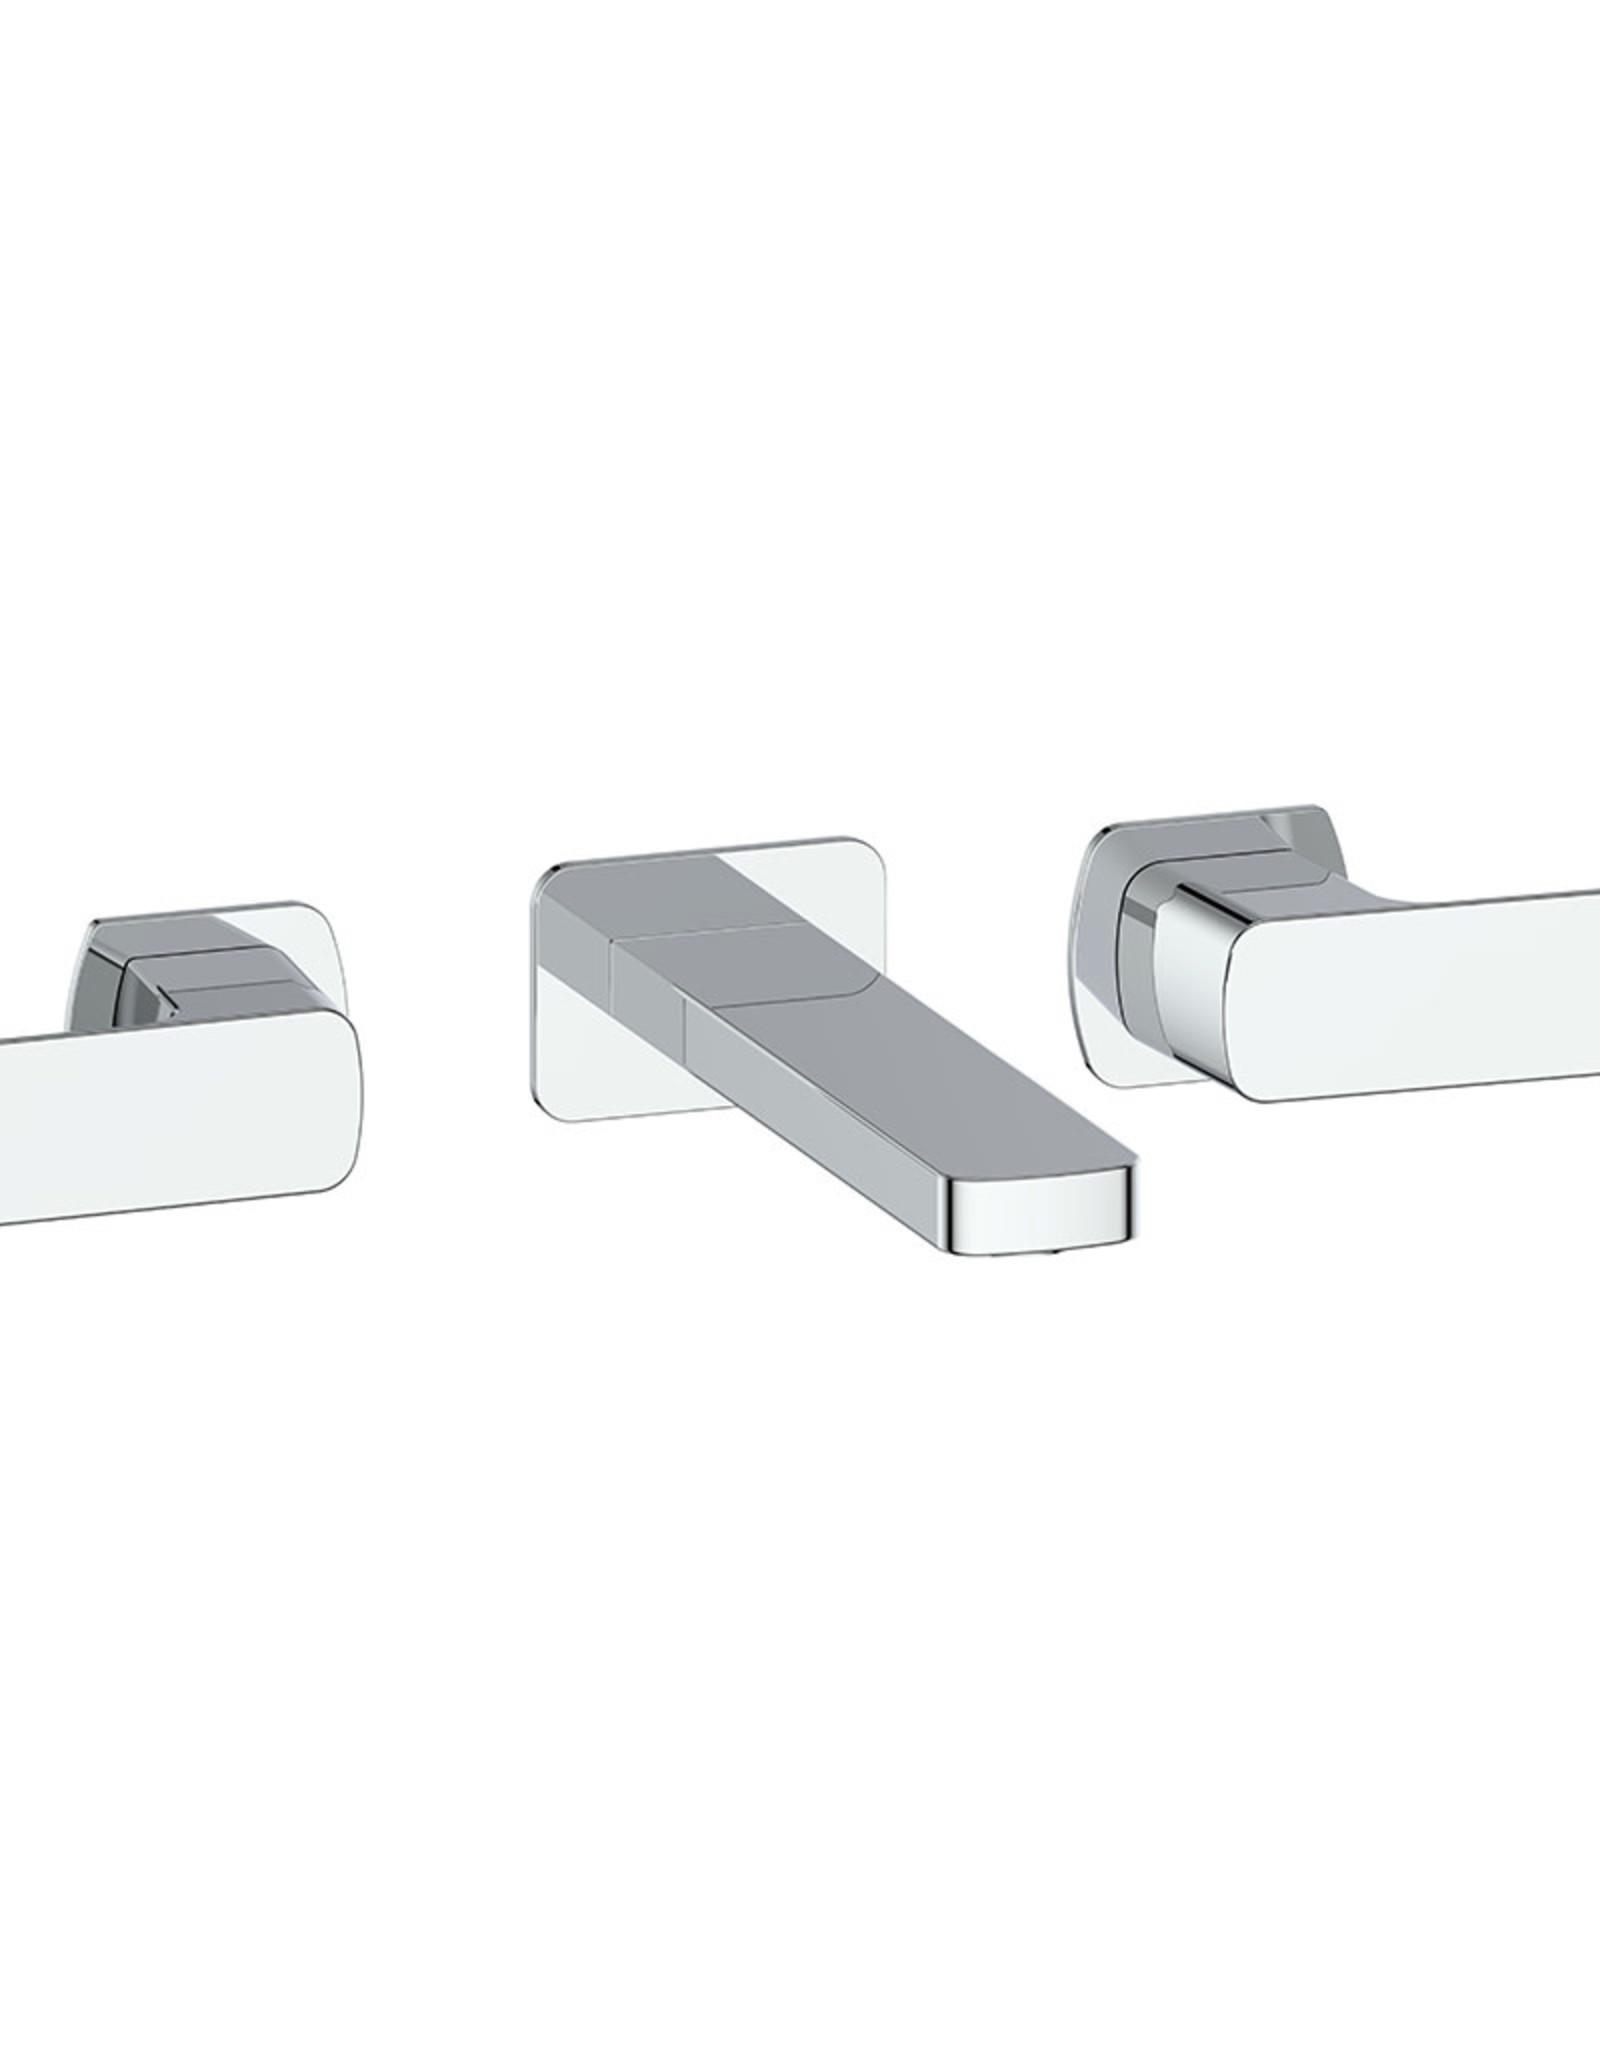 "Vogt Niveau Wall-Mounted 8"" Lav Faucet- Chrome"